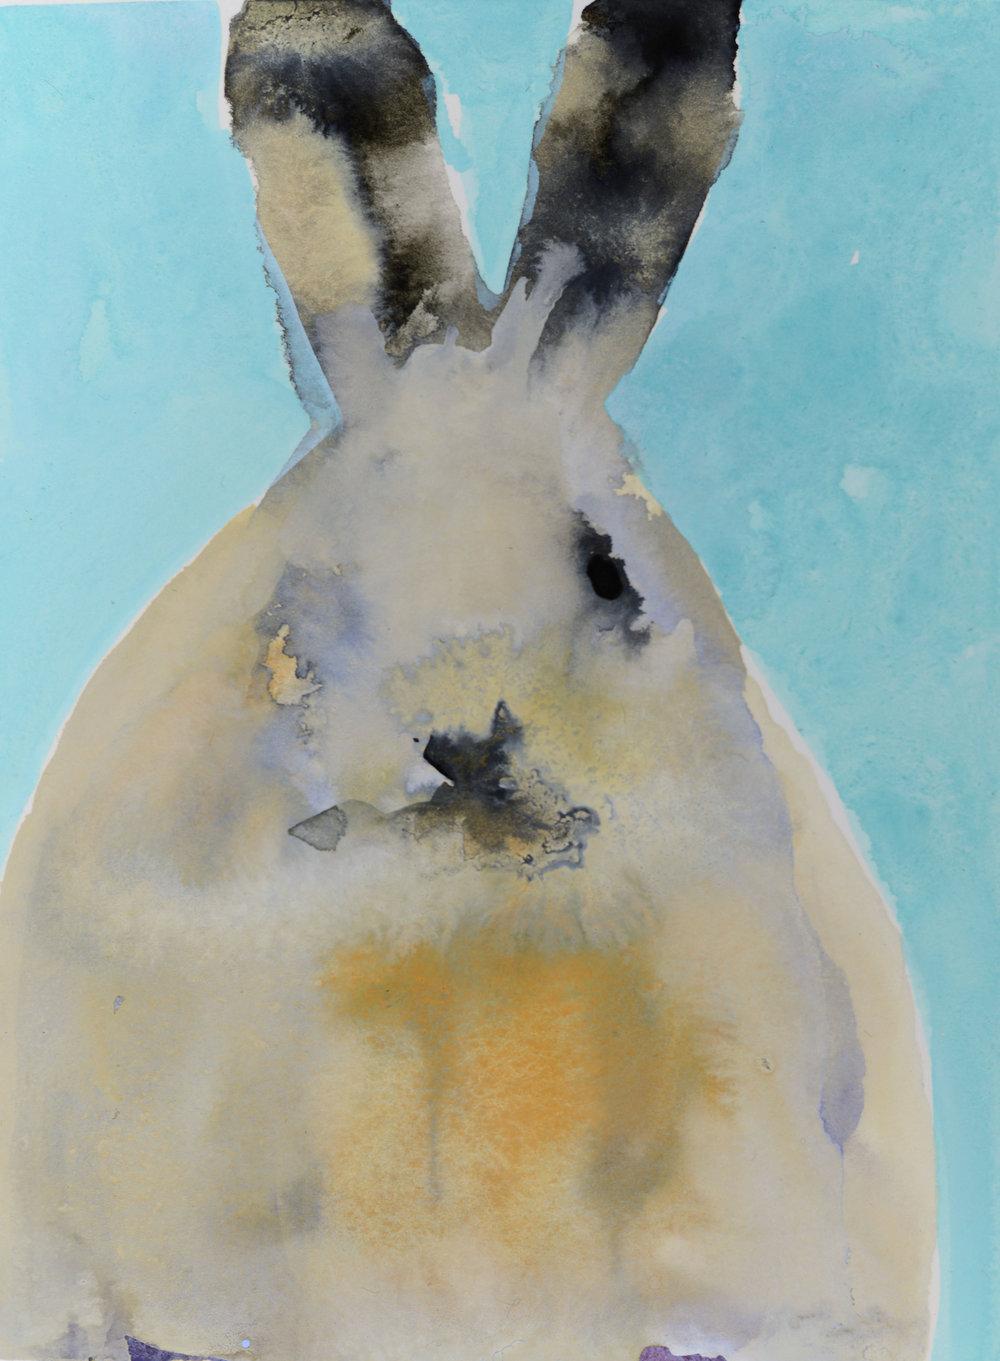 Rebecca_Kinkead_Arctic Hare Study no.10_inset on 11 x 7.5.jpg